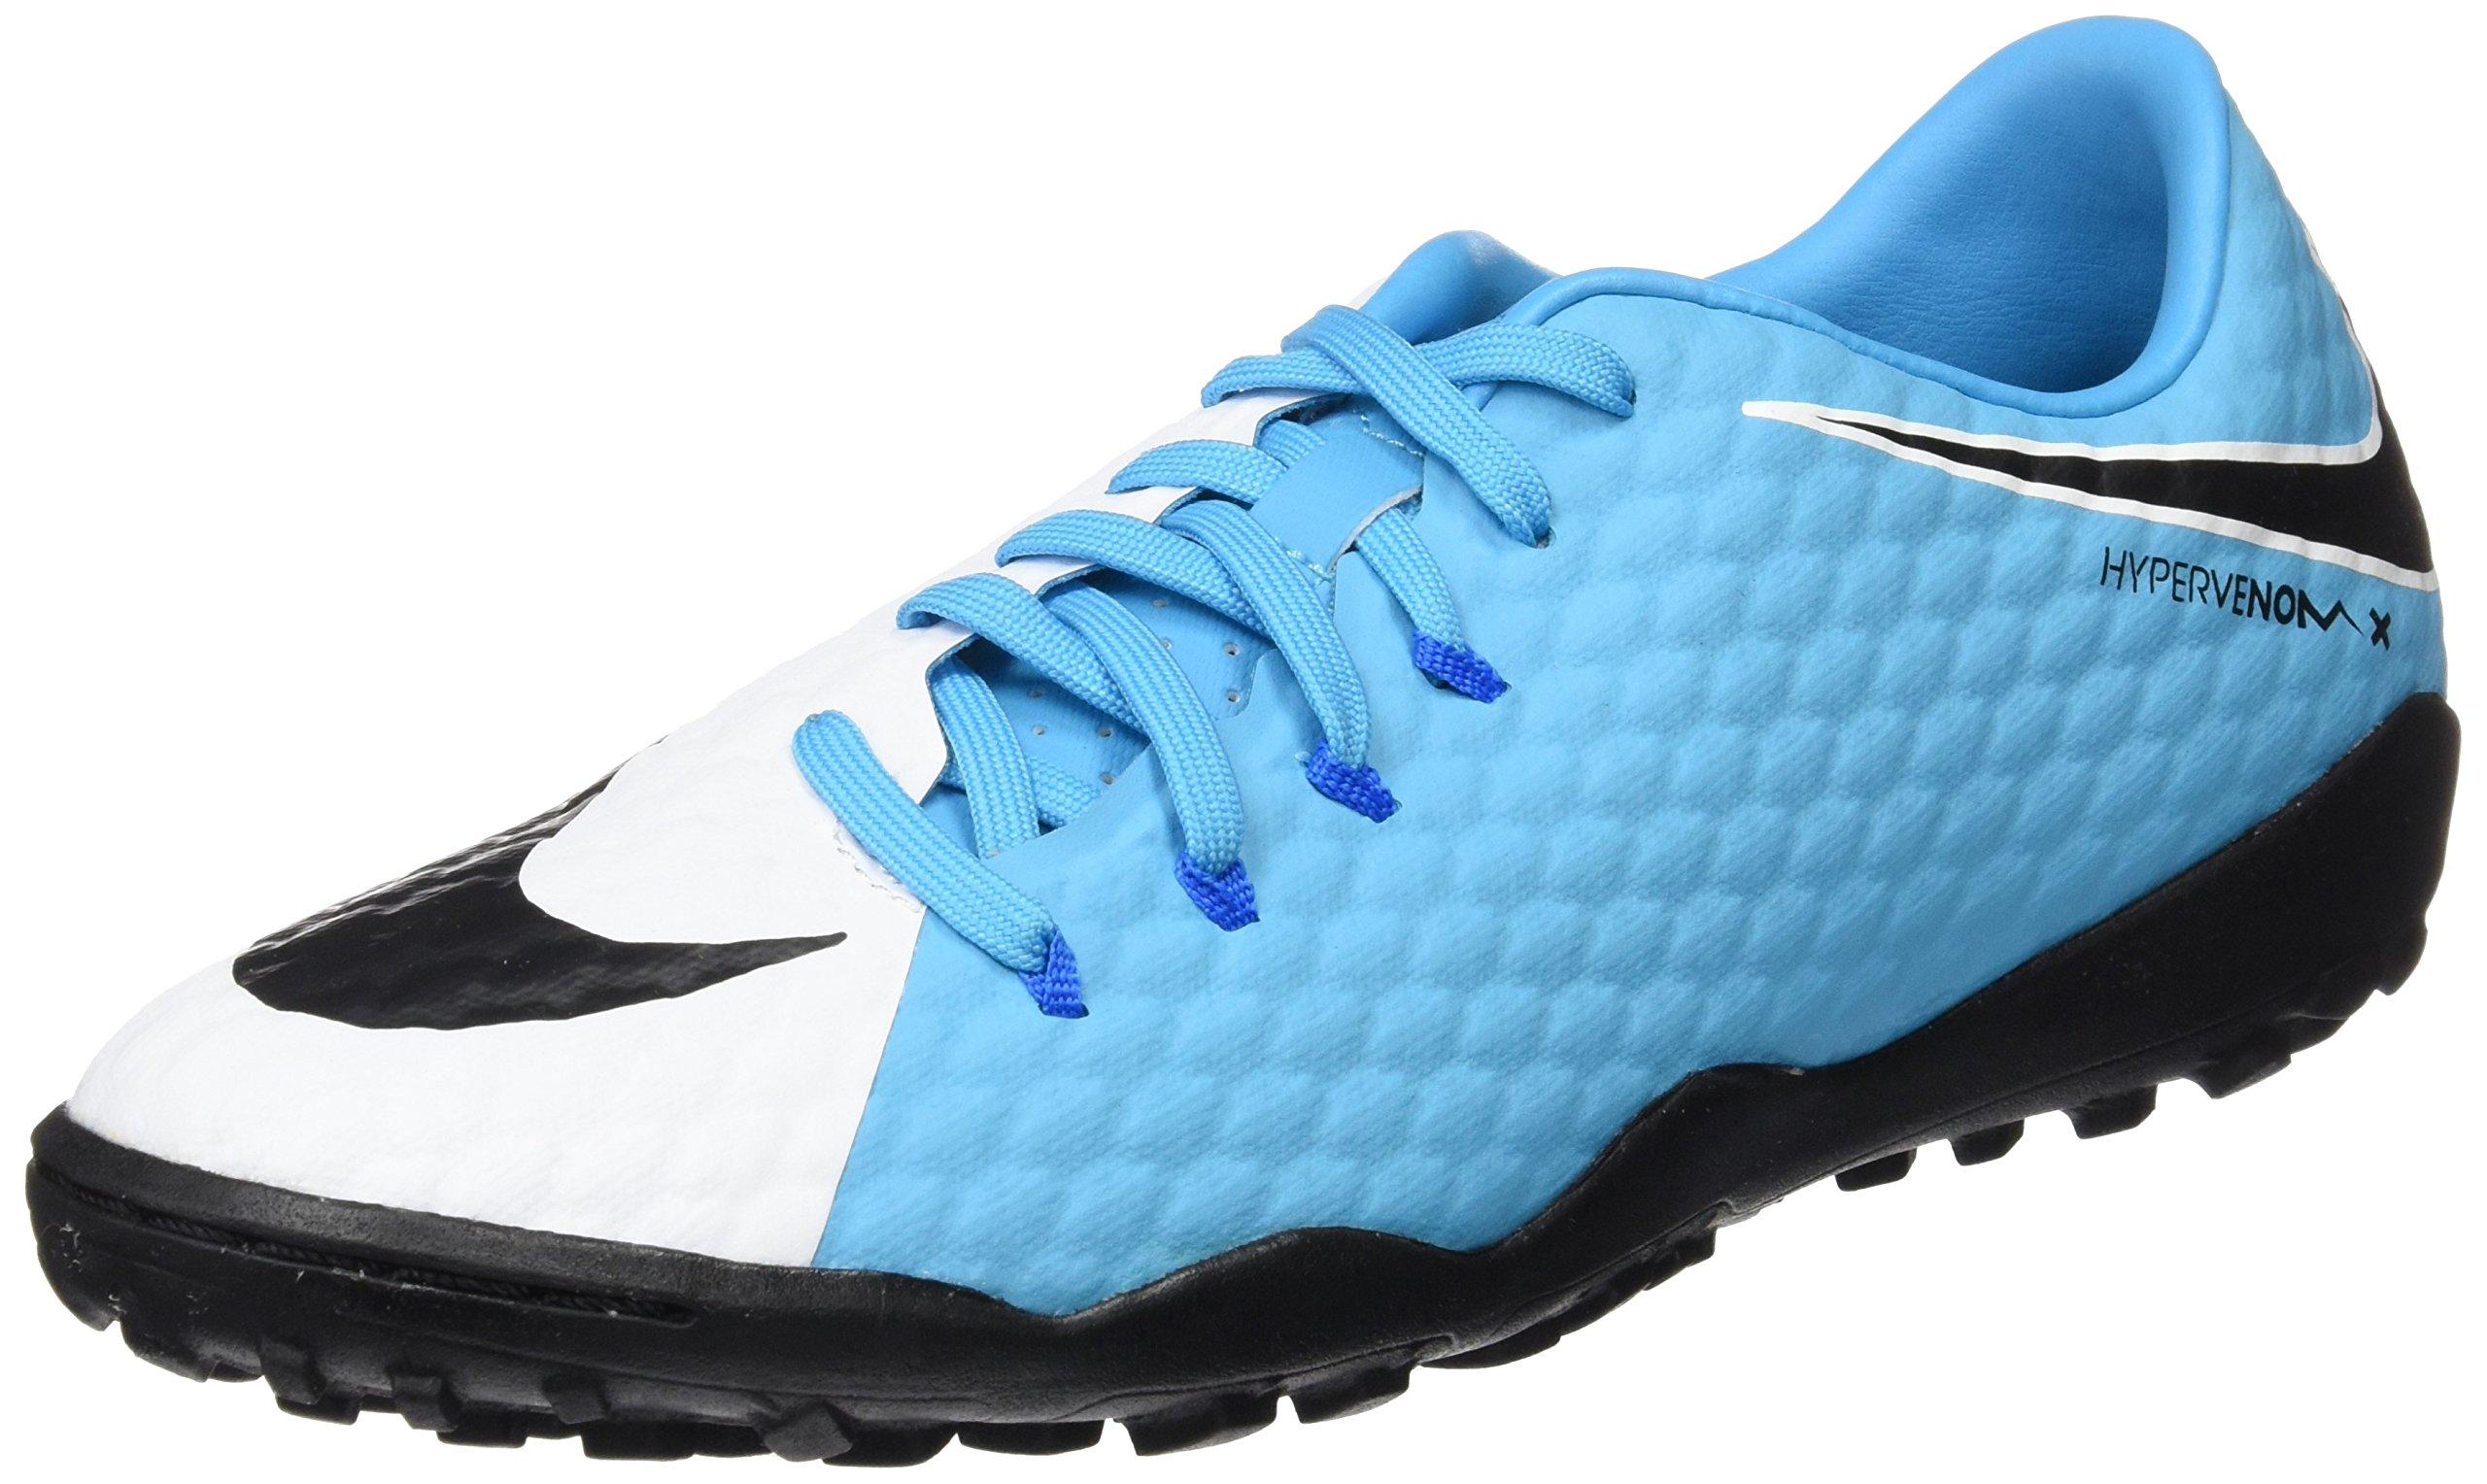 NIKE Hypervenomx Phelon III TF Mens Football Boots 852562 Soccer Cleats (US 9, White Black Photo Blue 104)